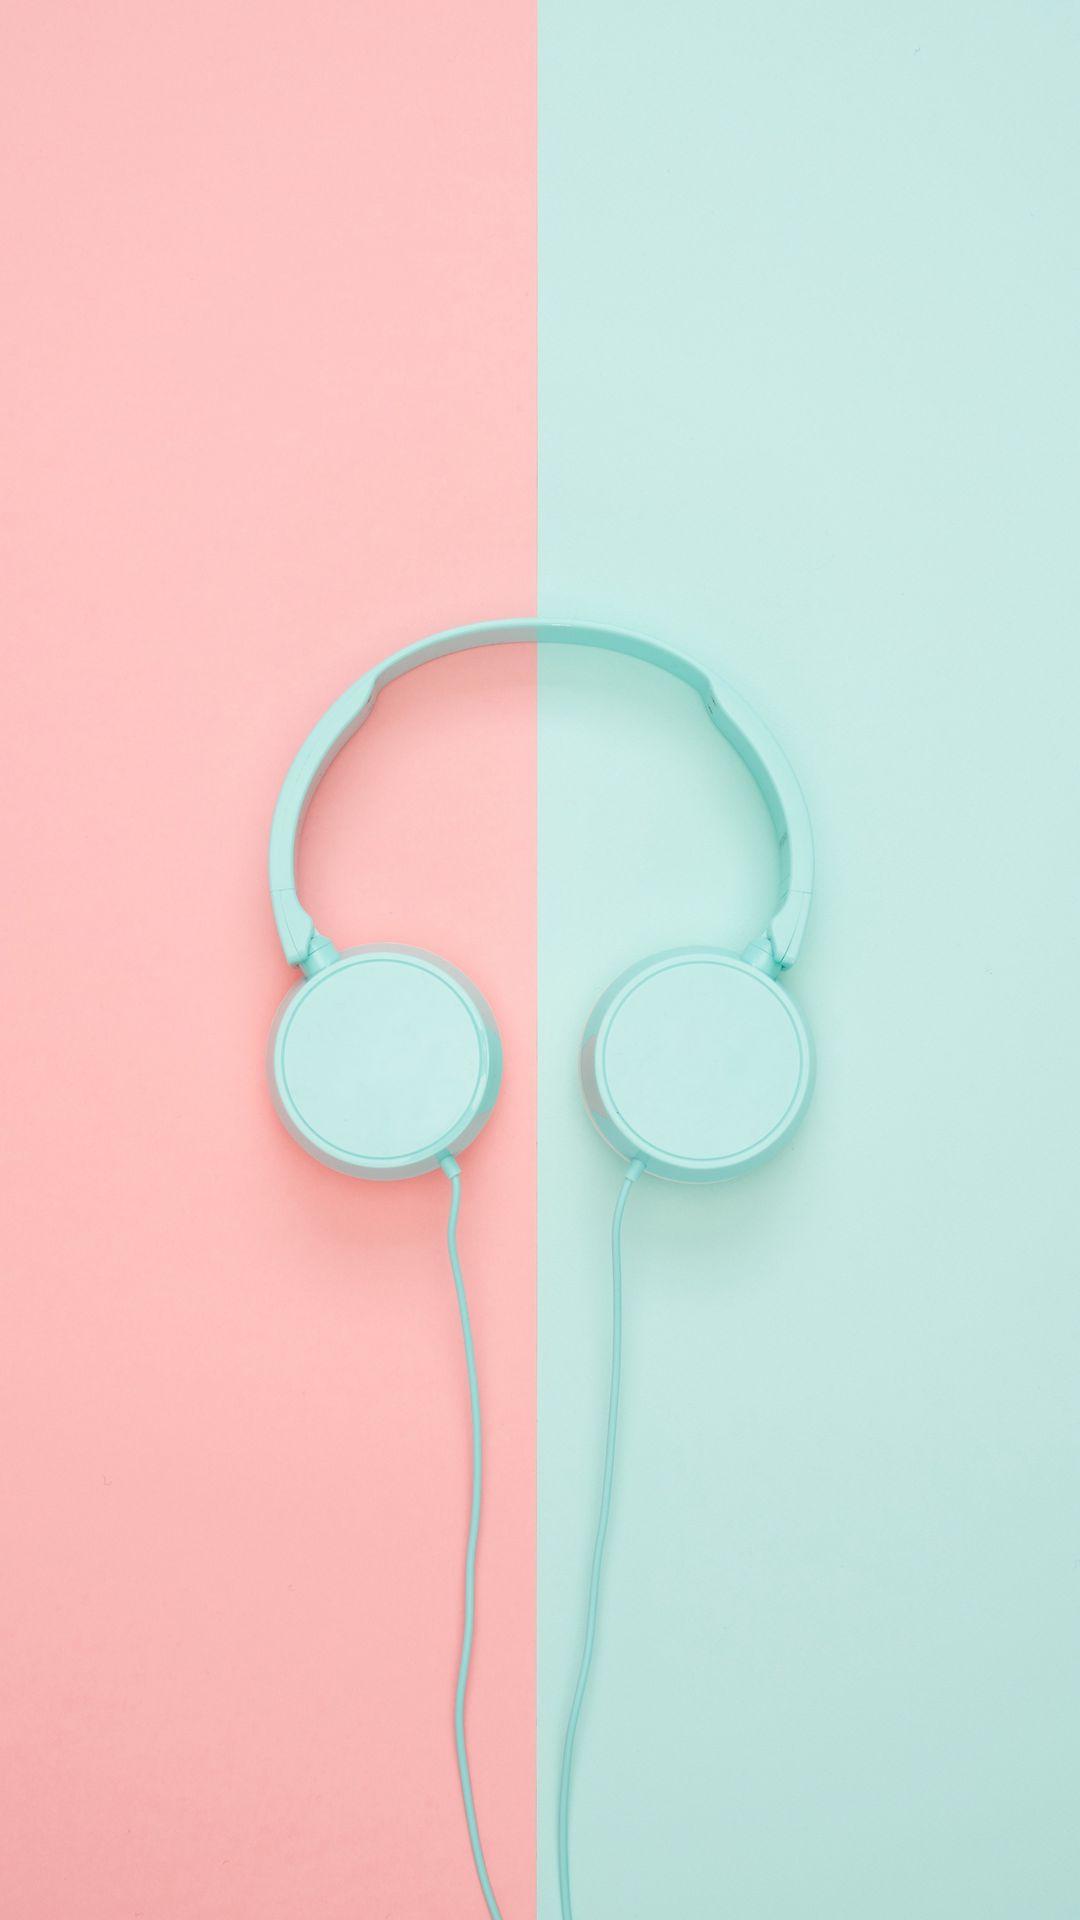 1080x1920 Wallpaper headphones, minimalism, pastel, pink